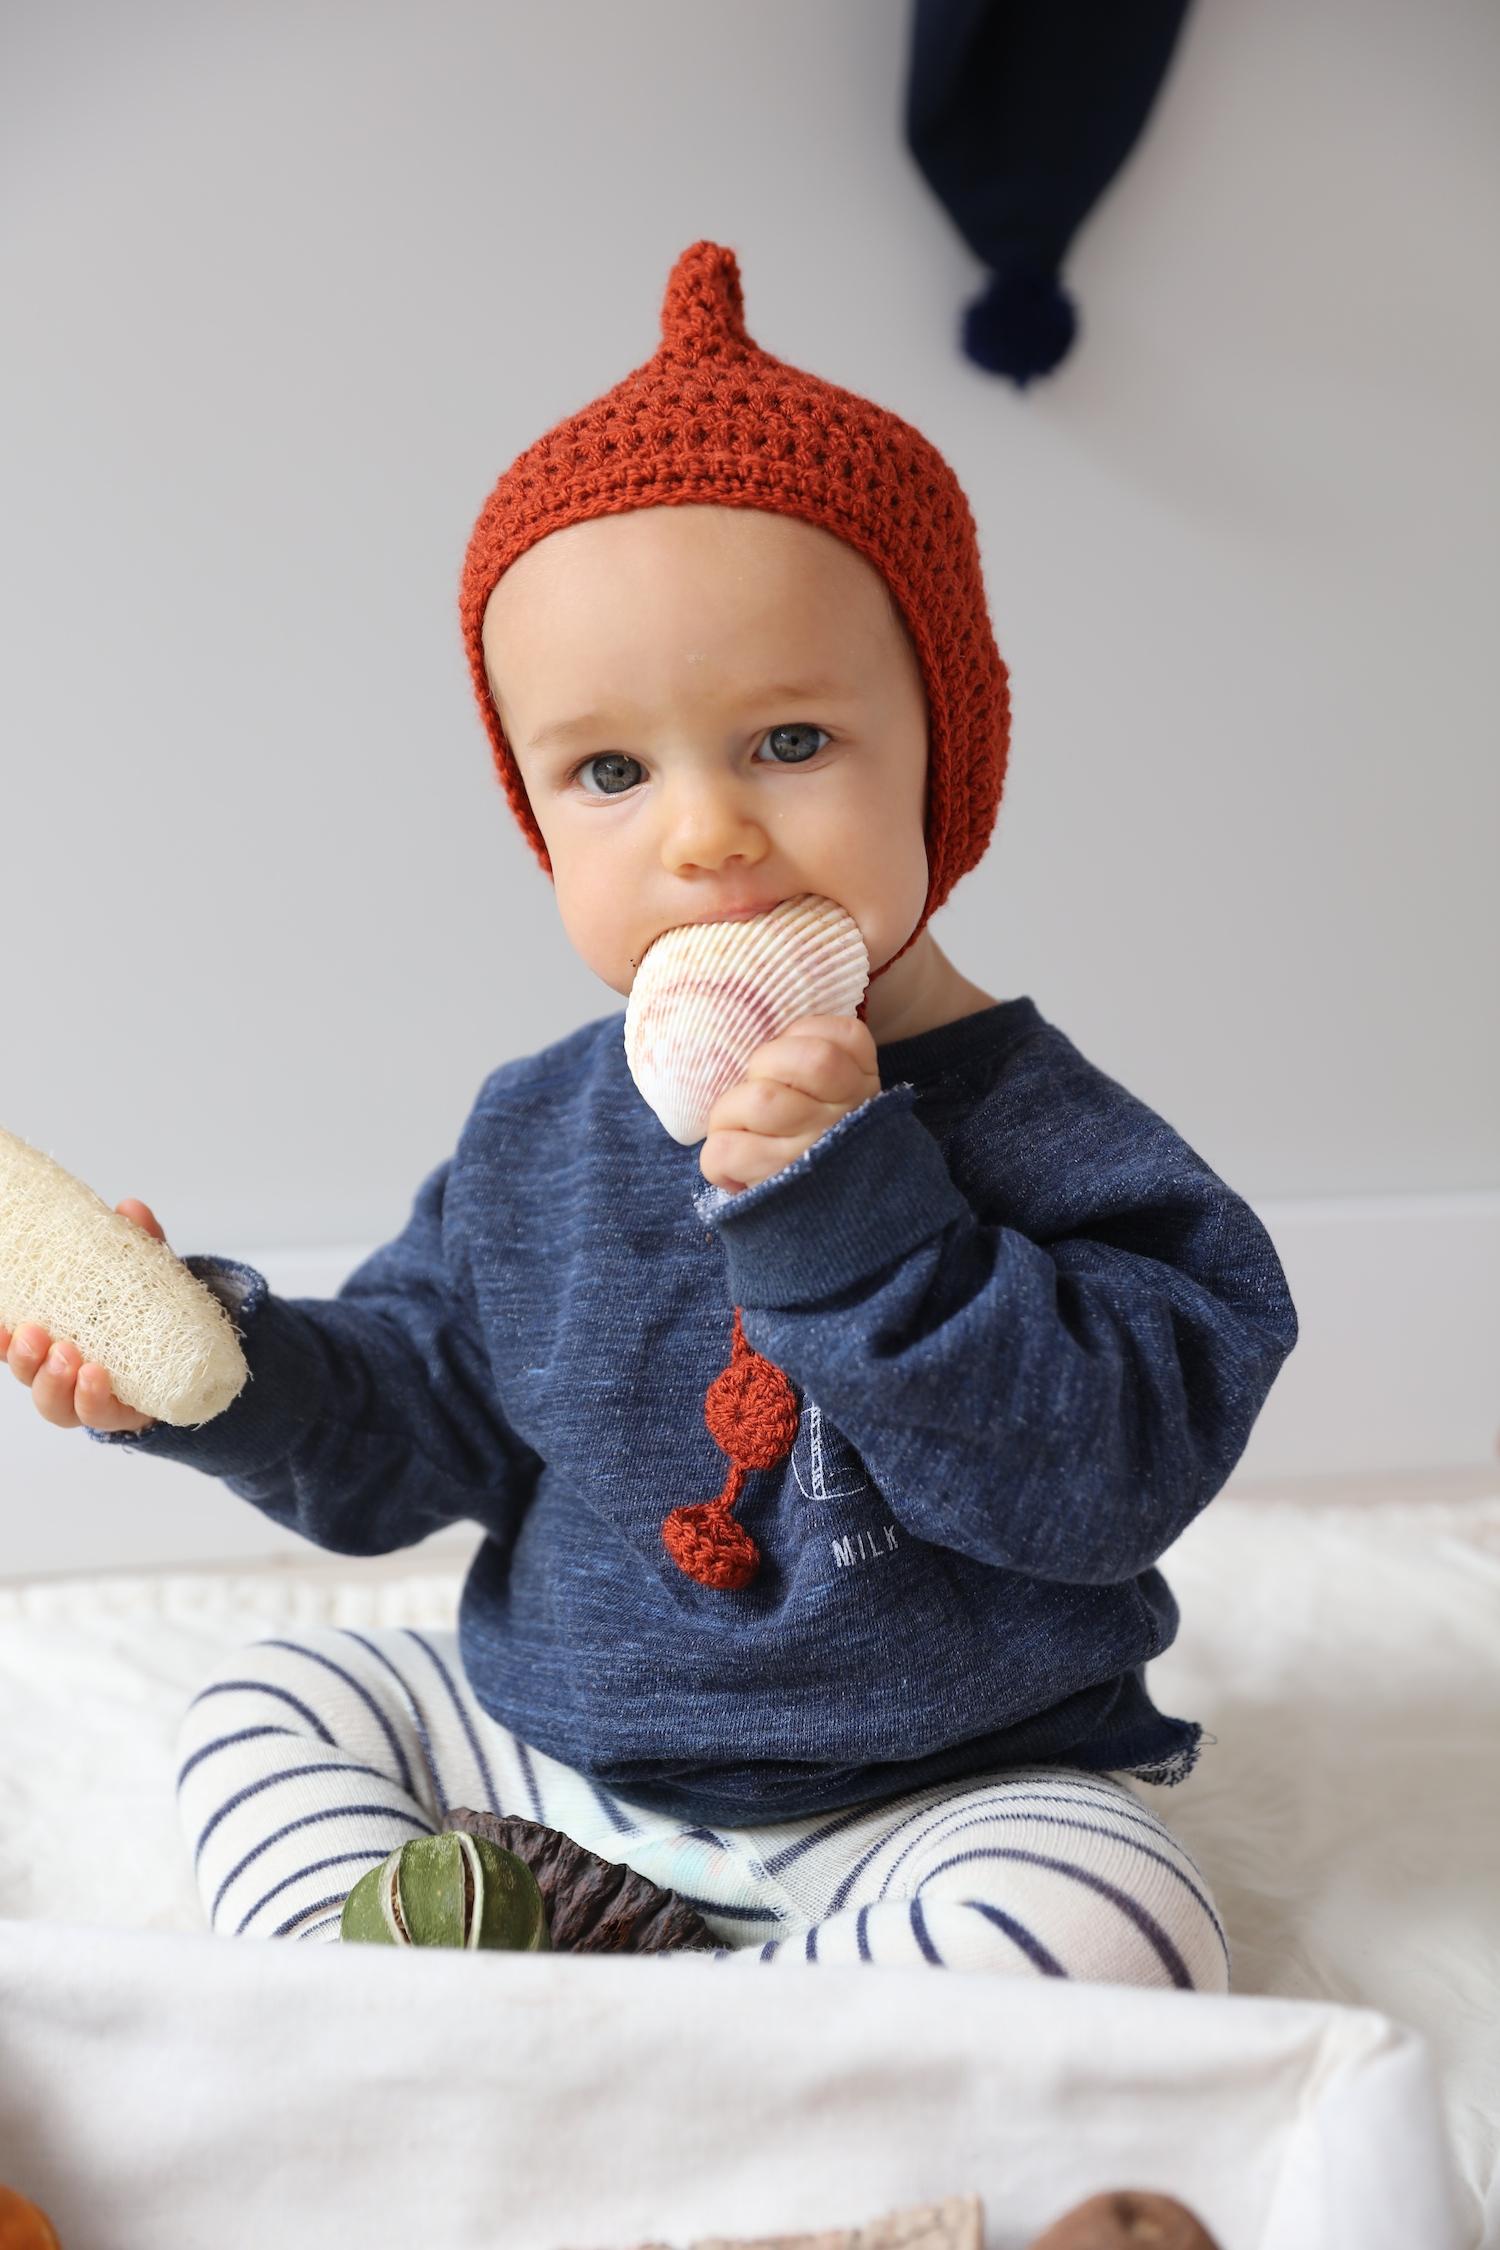 baby_sensory_basket_knitted_hat_grasp_gather